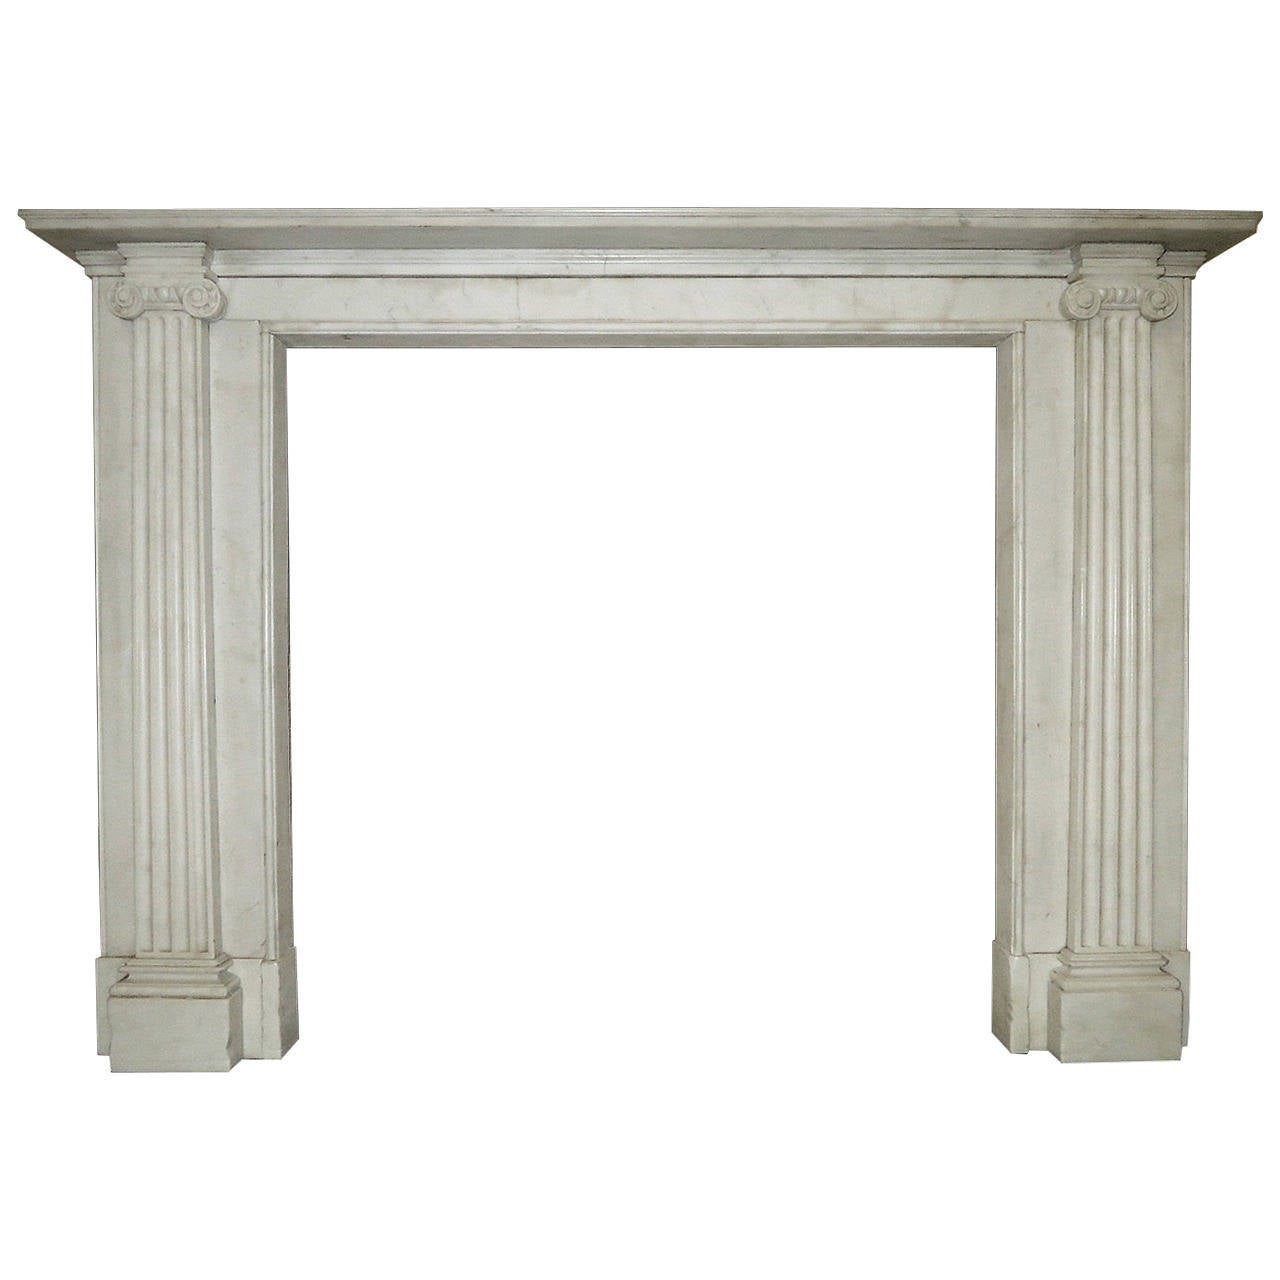 Regency Style White Marble Fireplace Mantel